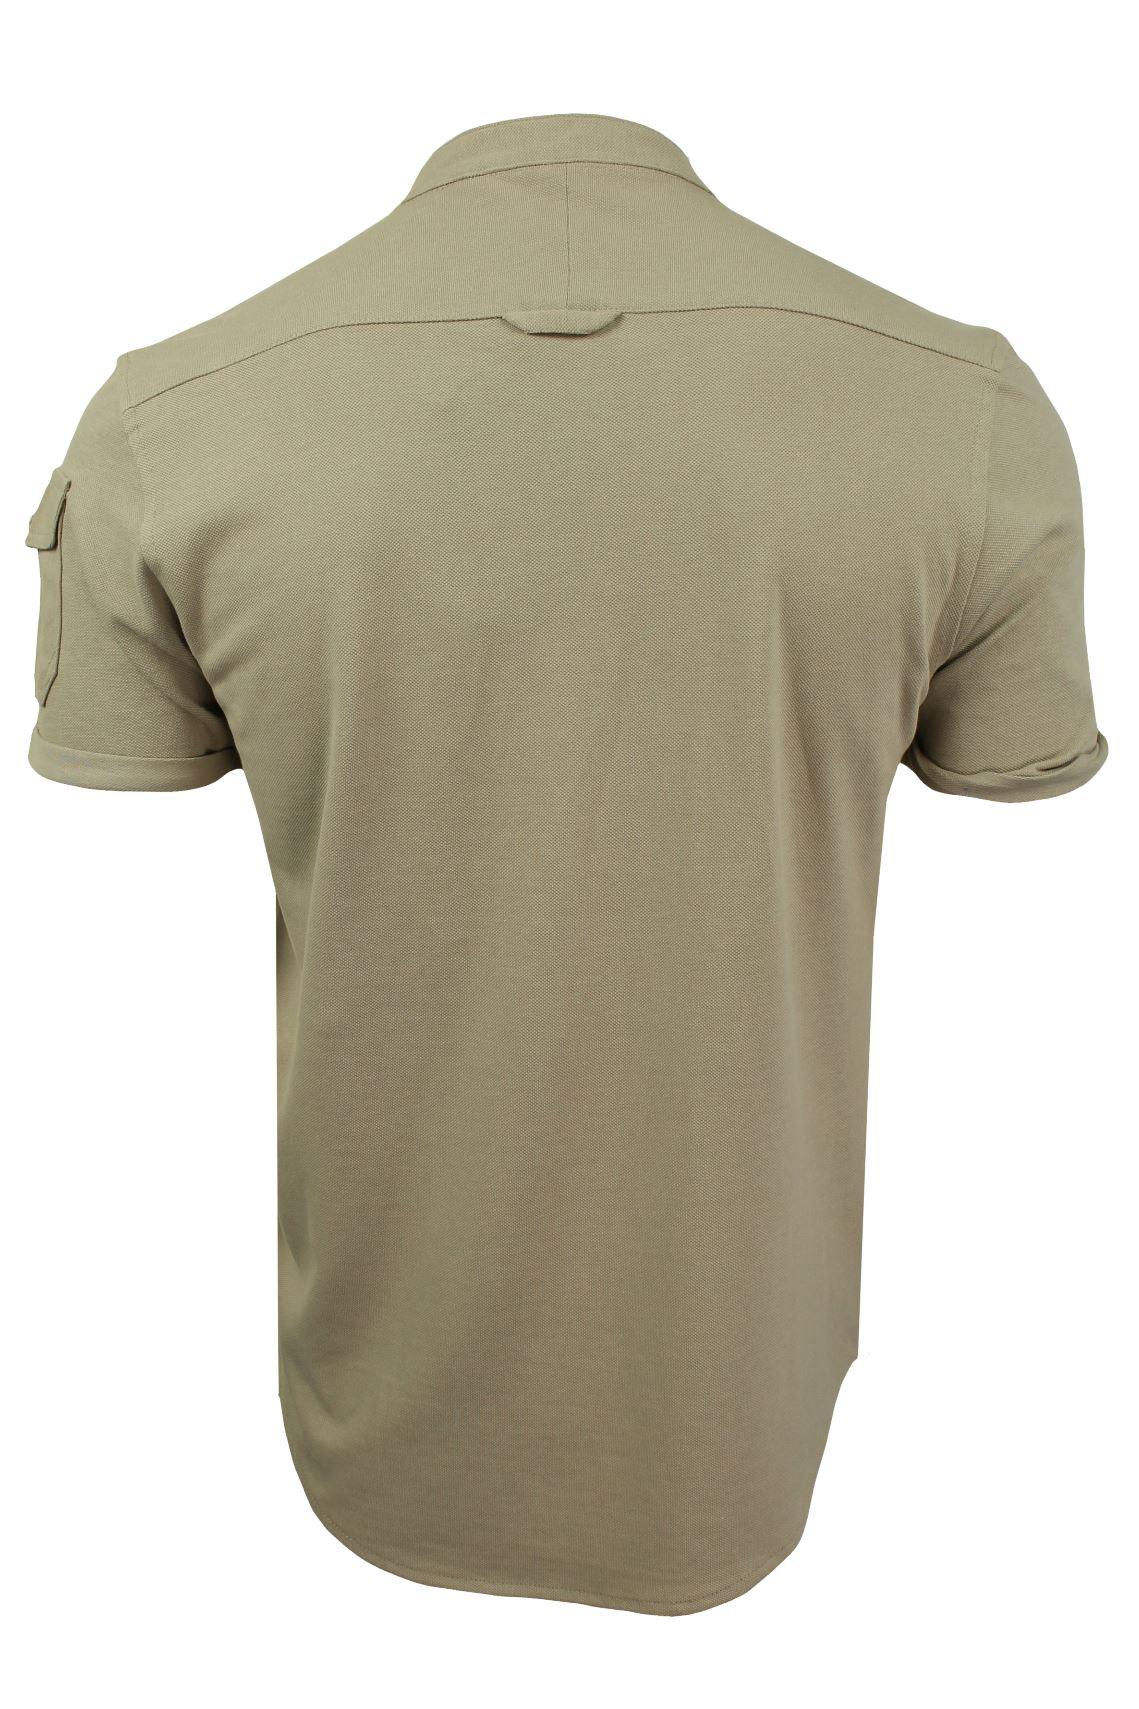 Mens-Grandad-Collar-Pique-Shirt-by-Brave-Soul-039-Joey-039 thumbnail 11